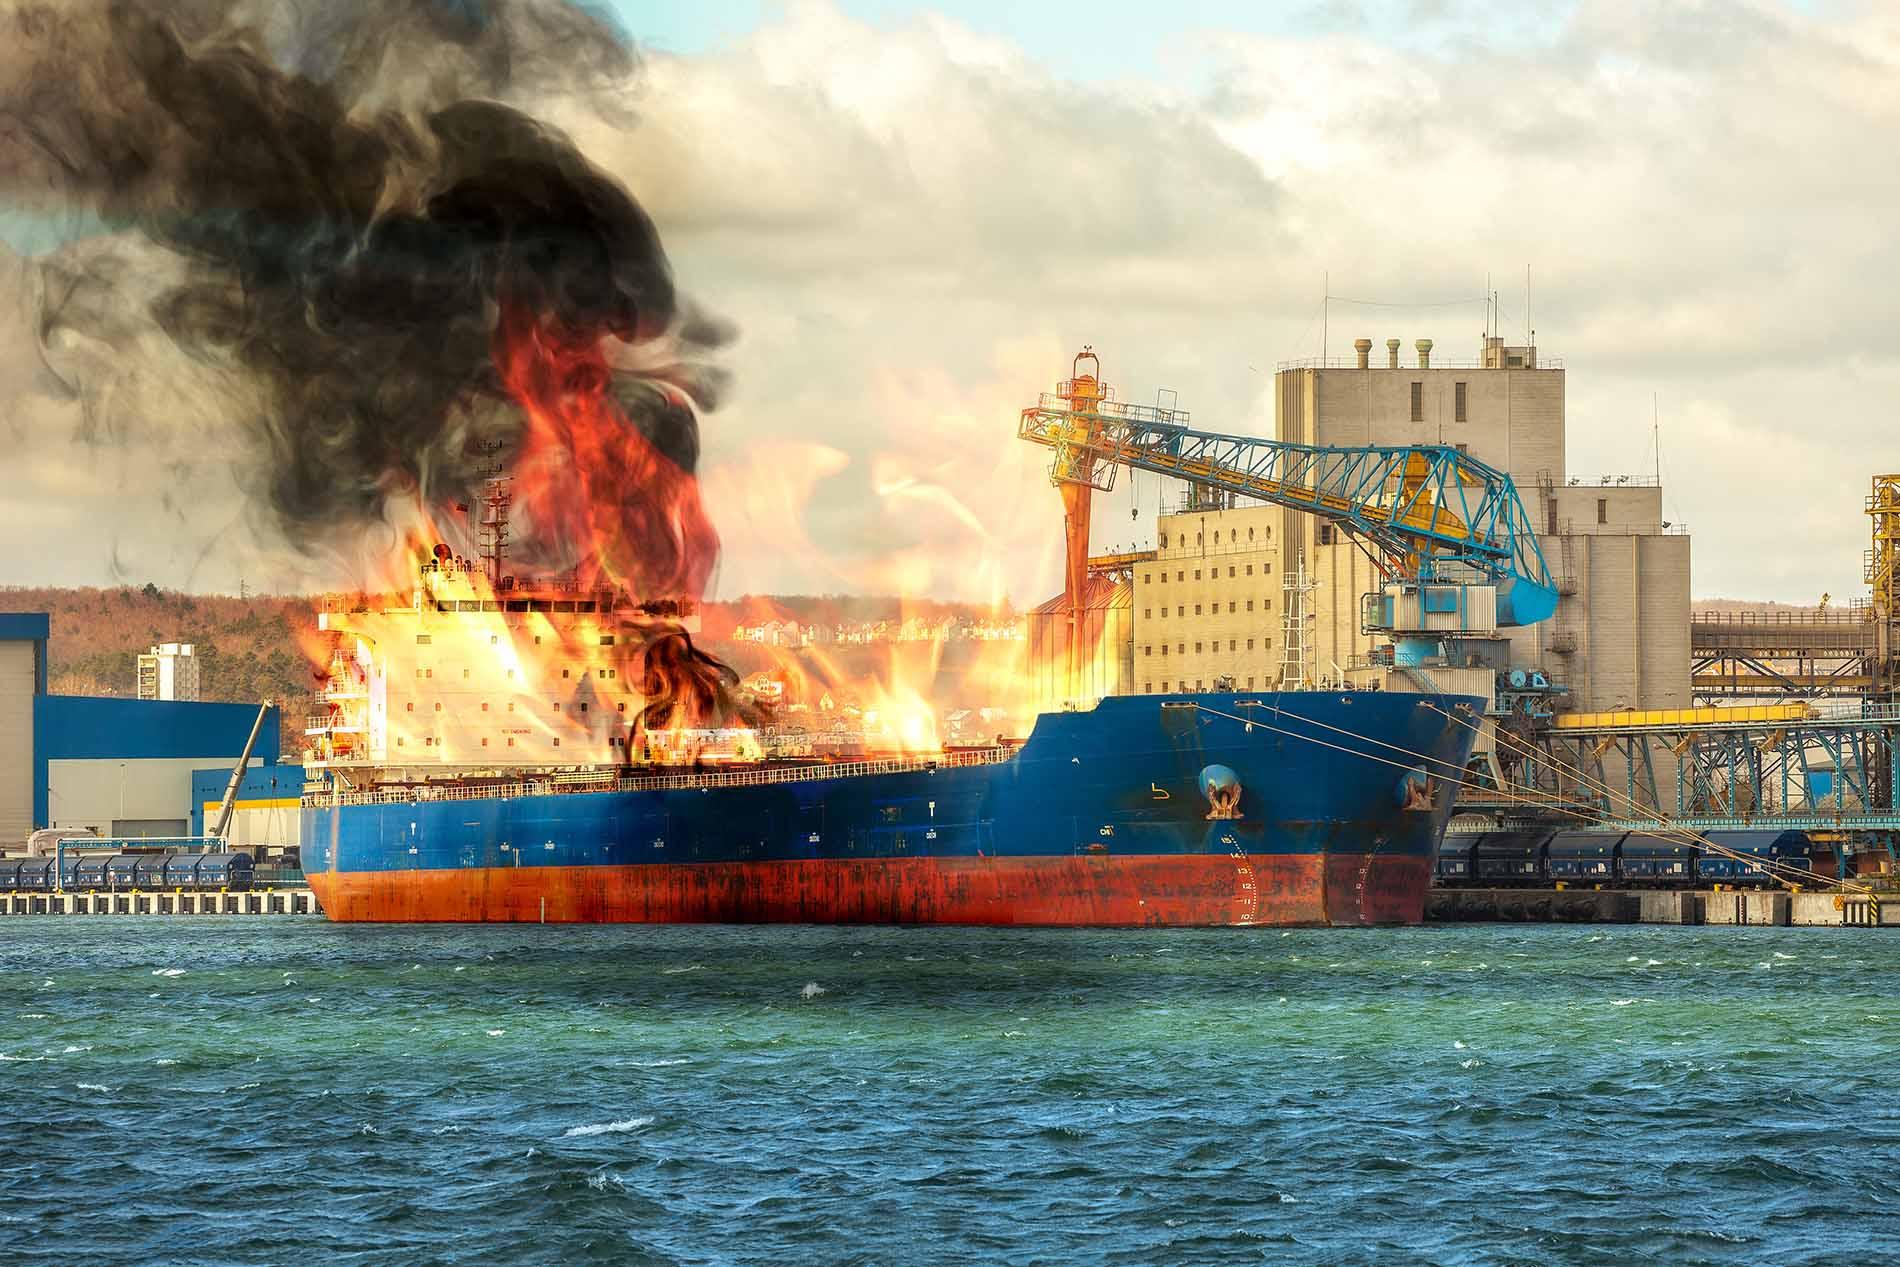 Ship on fire